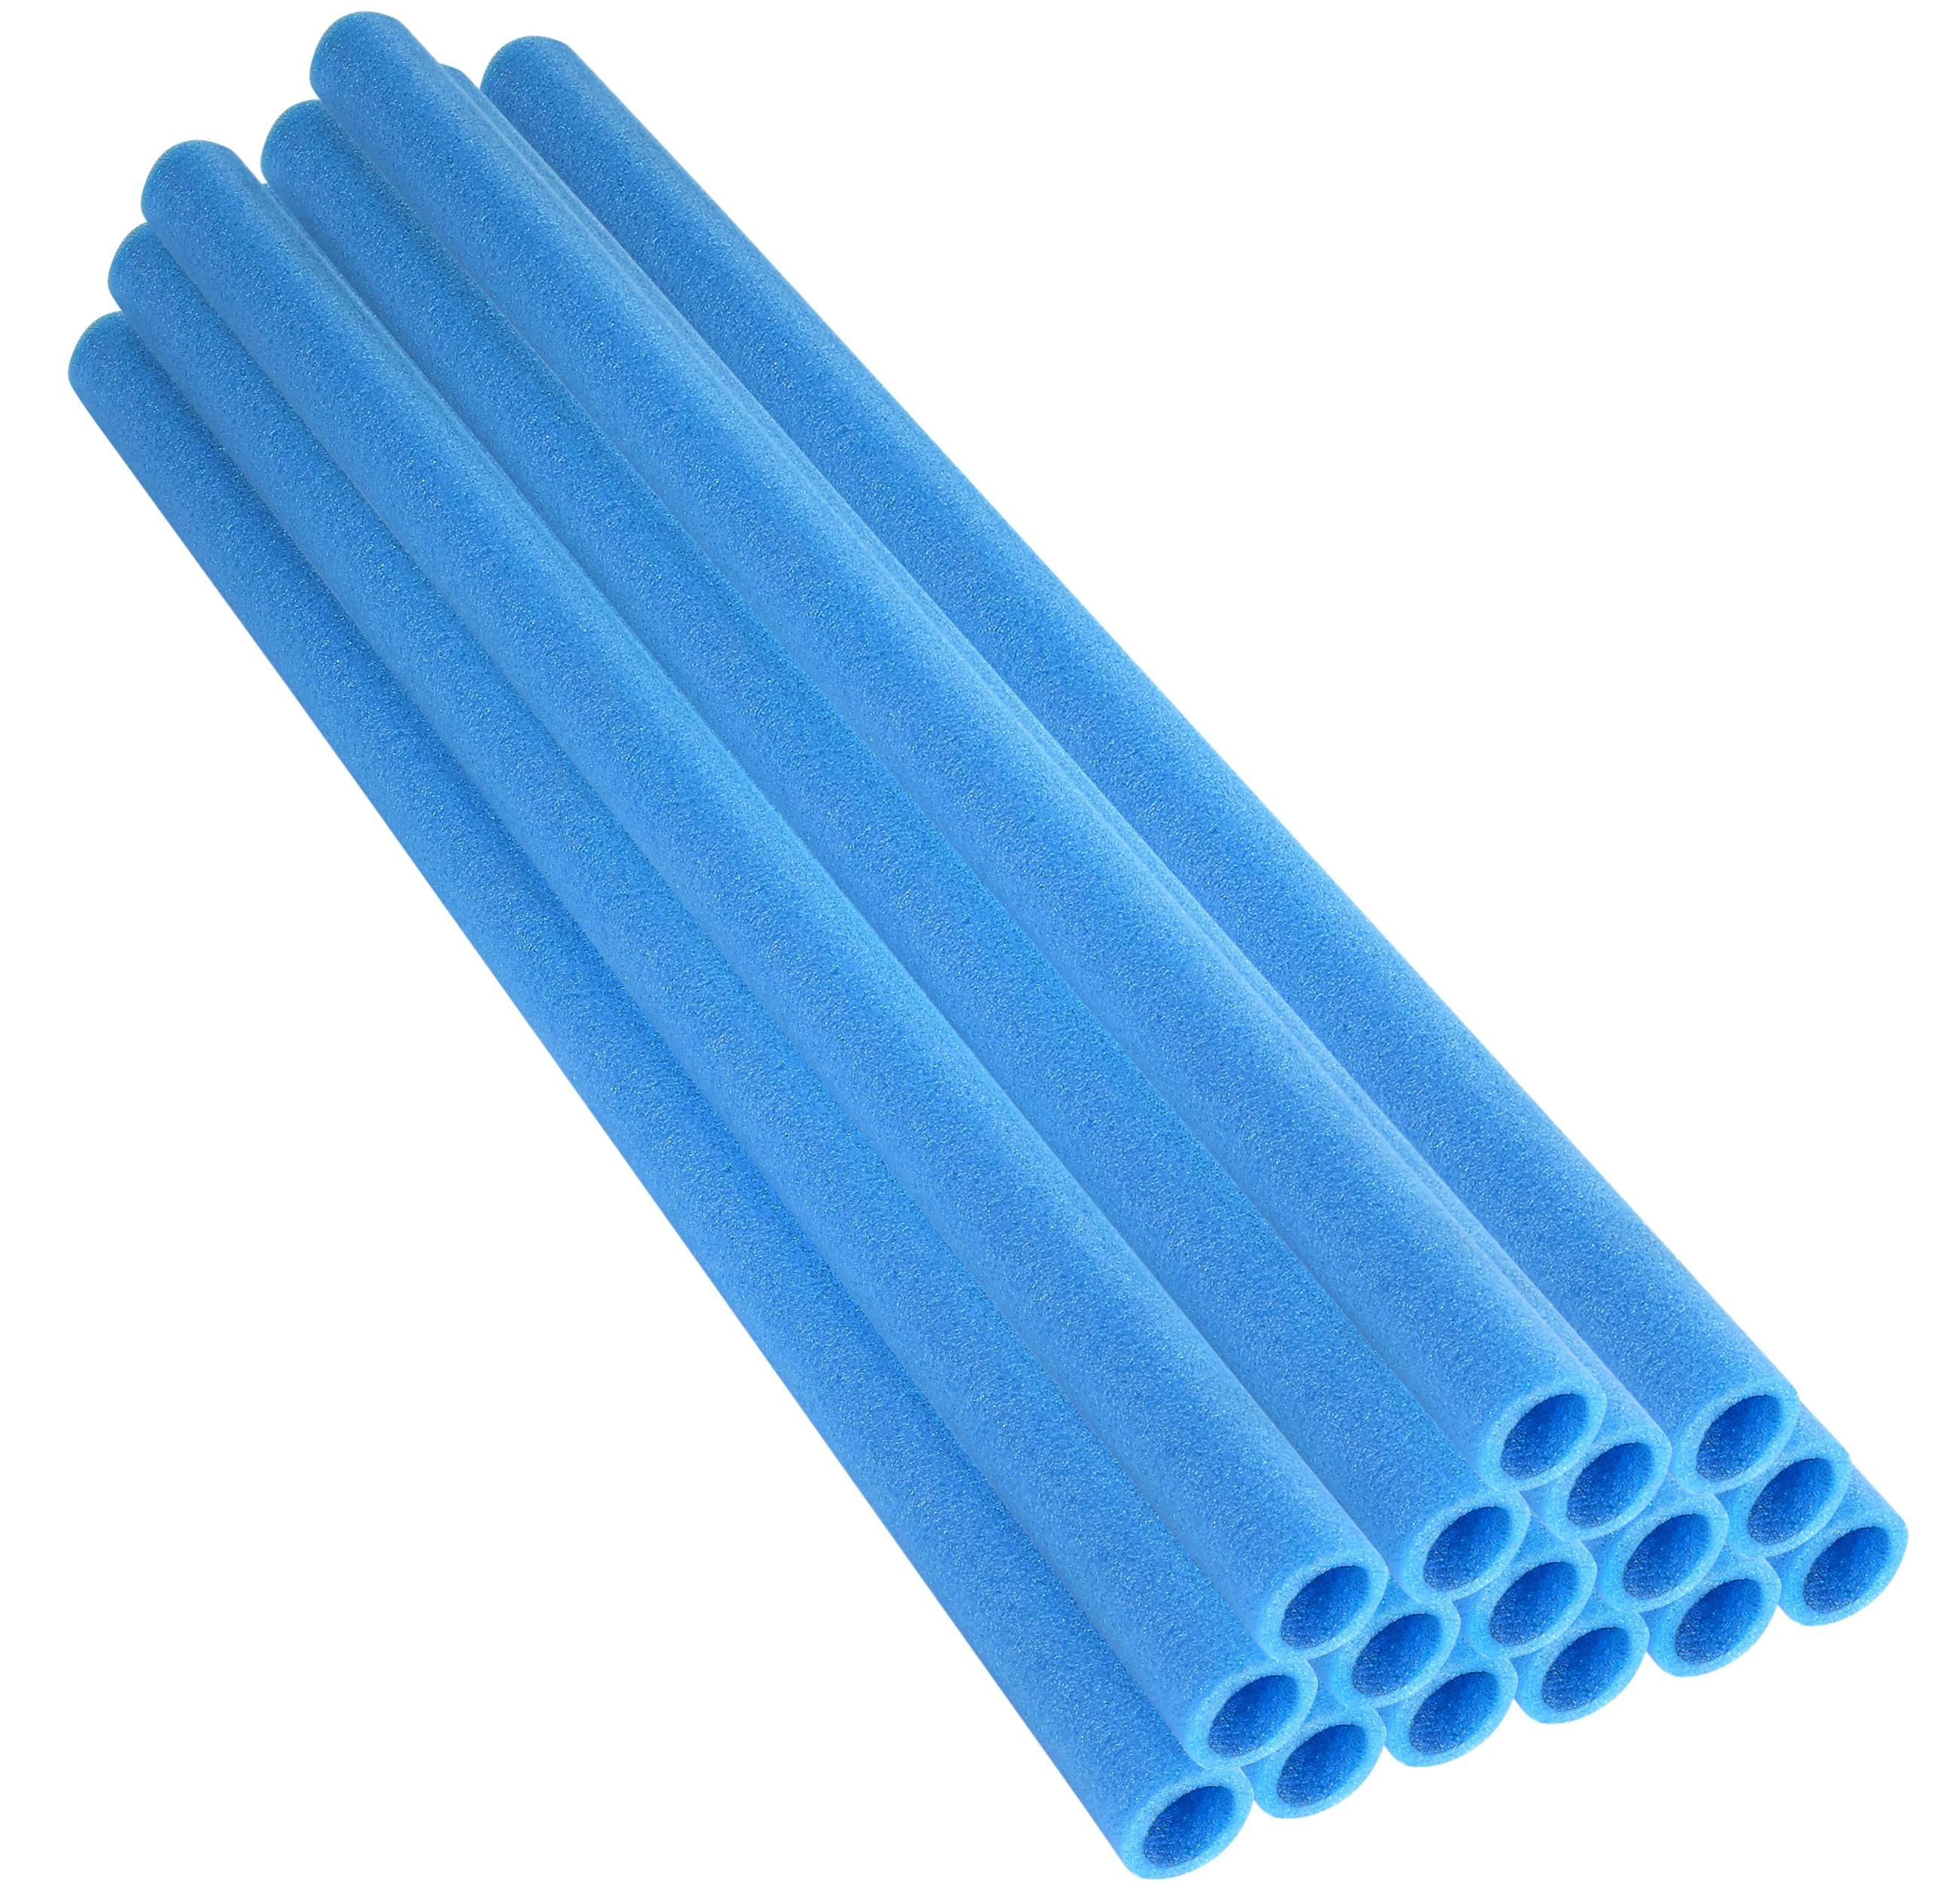 "37 Inch Trampoline Pole Foam Sleeves, fits for 1"" Diameter Pole - Set of 16 - Blue"